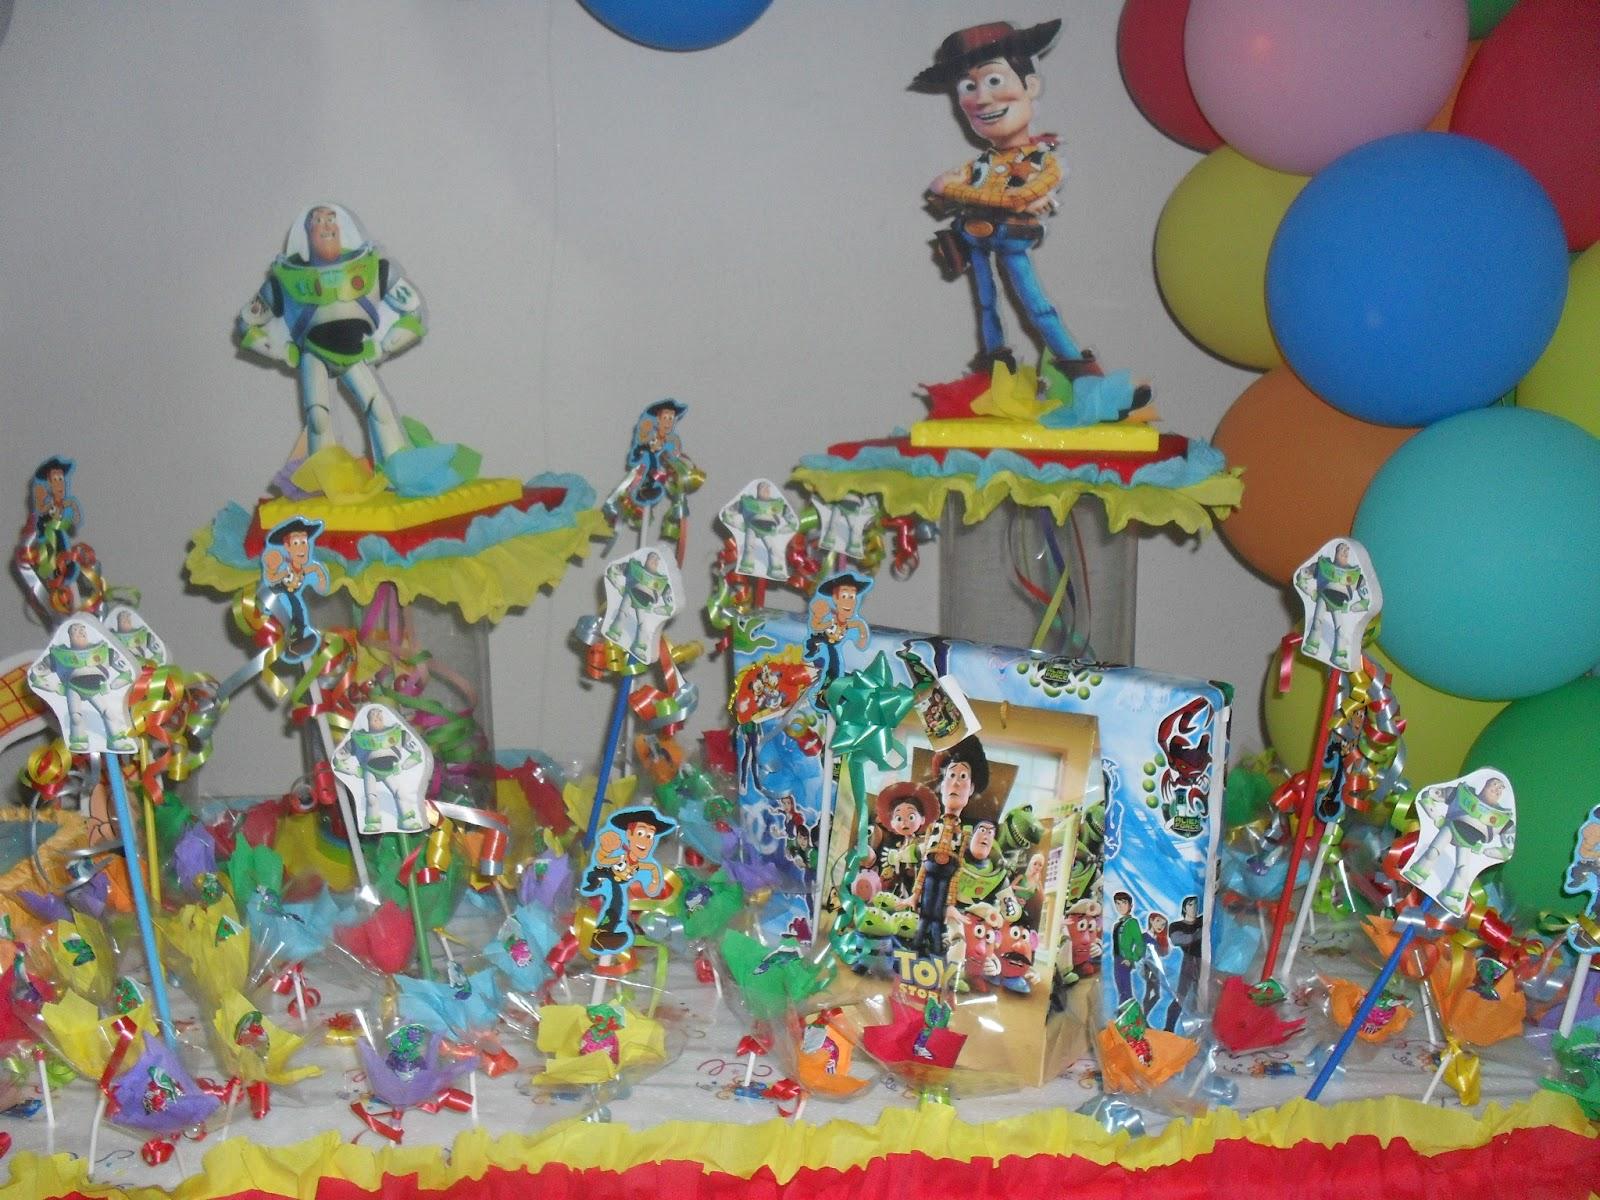 Imágenes de chupeteras de Toy Story - Imagui